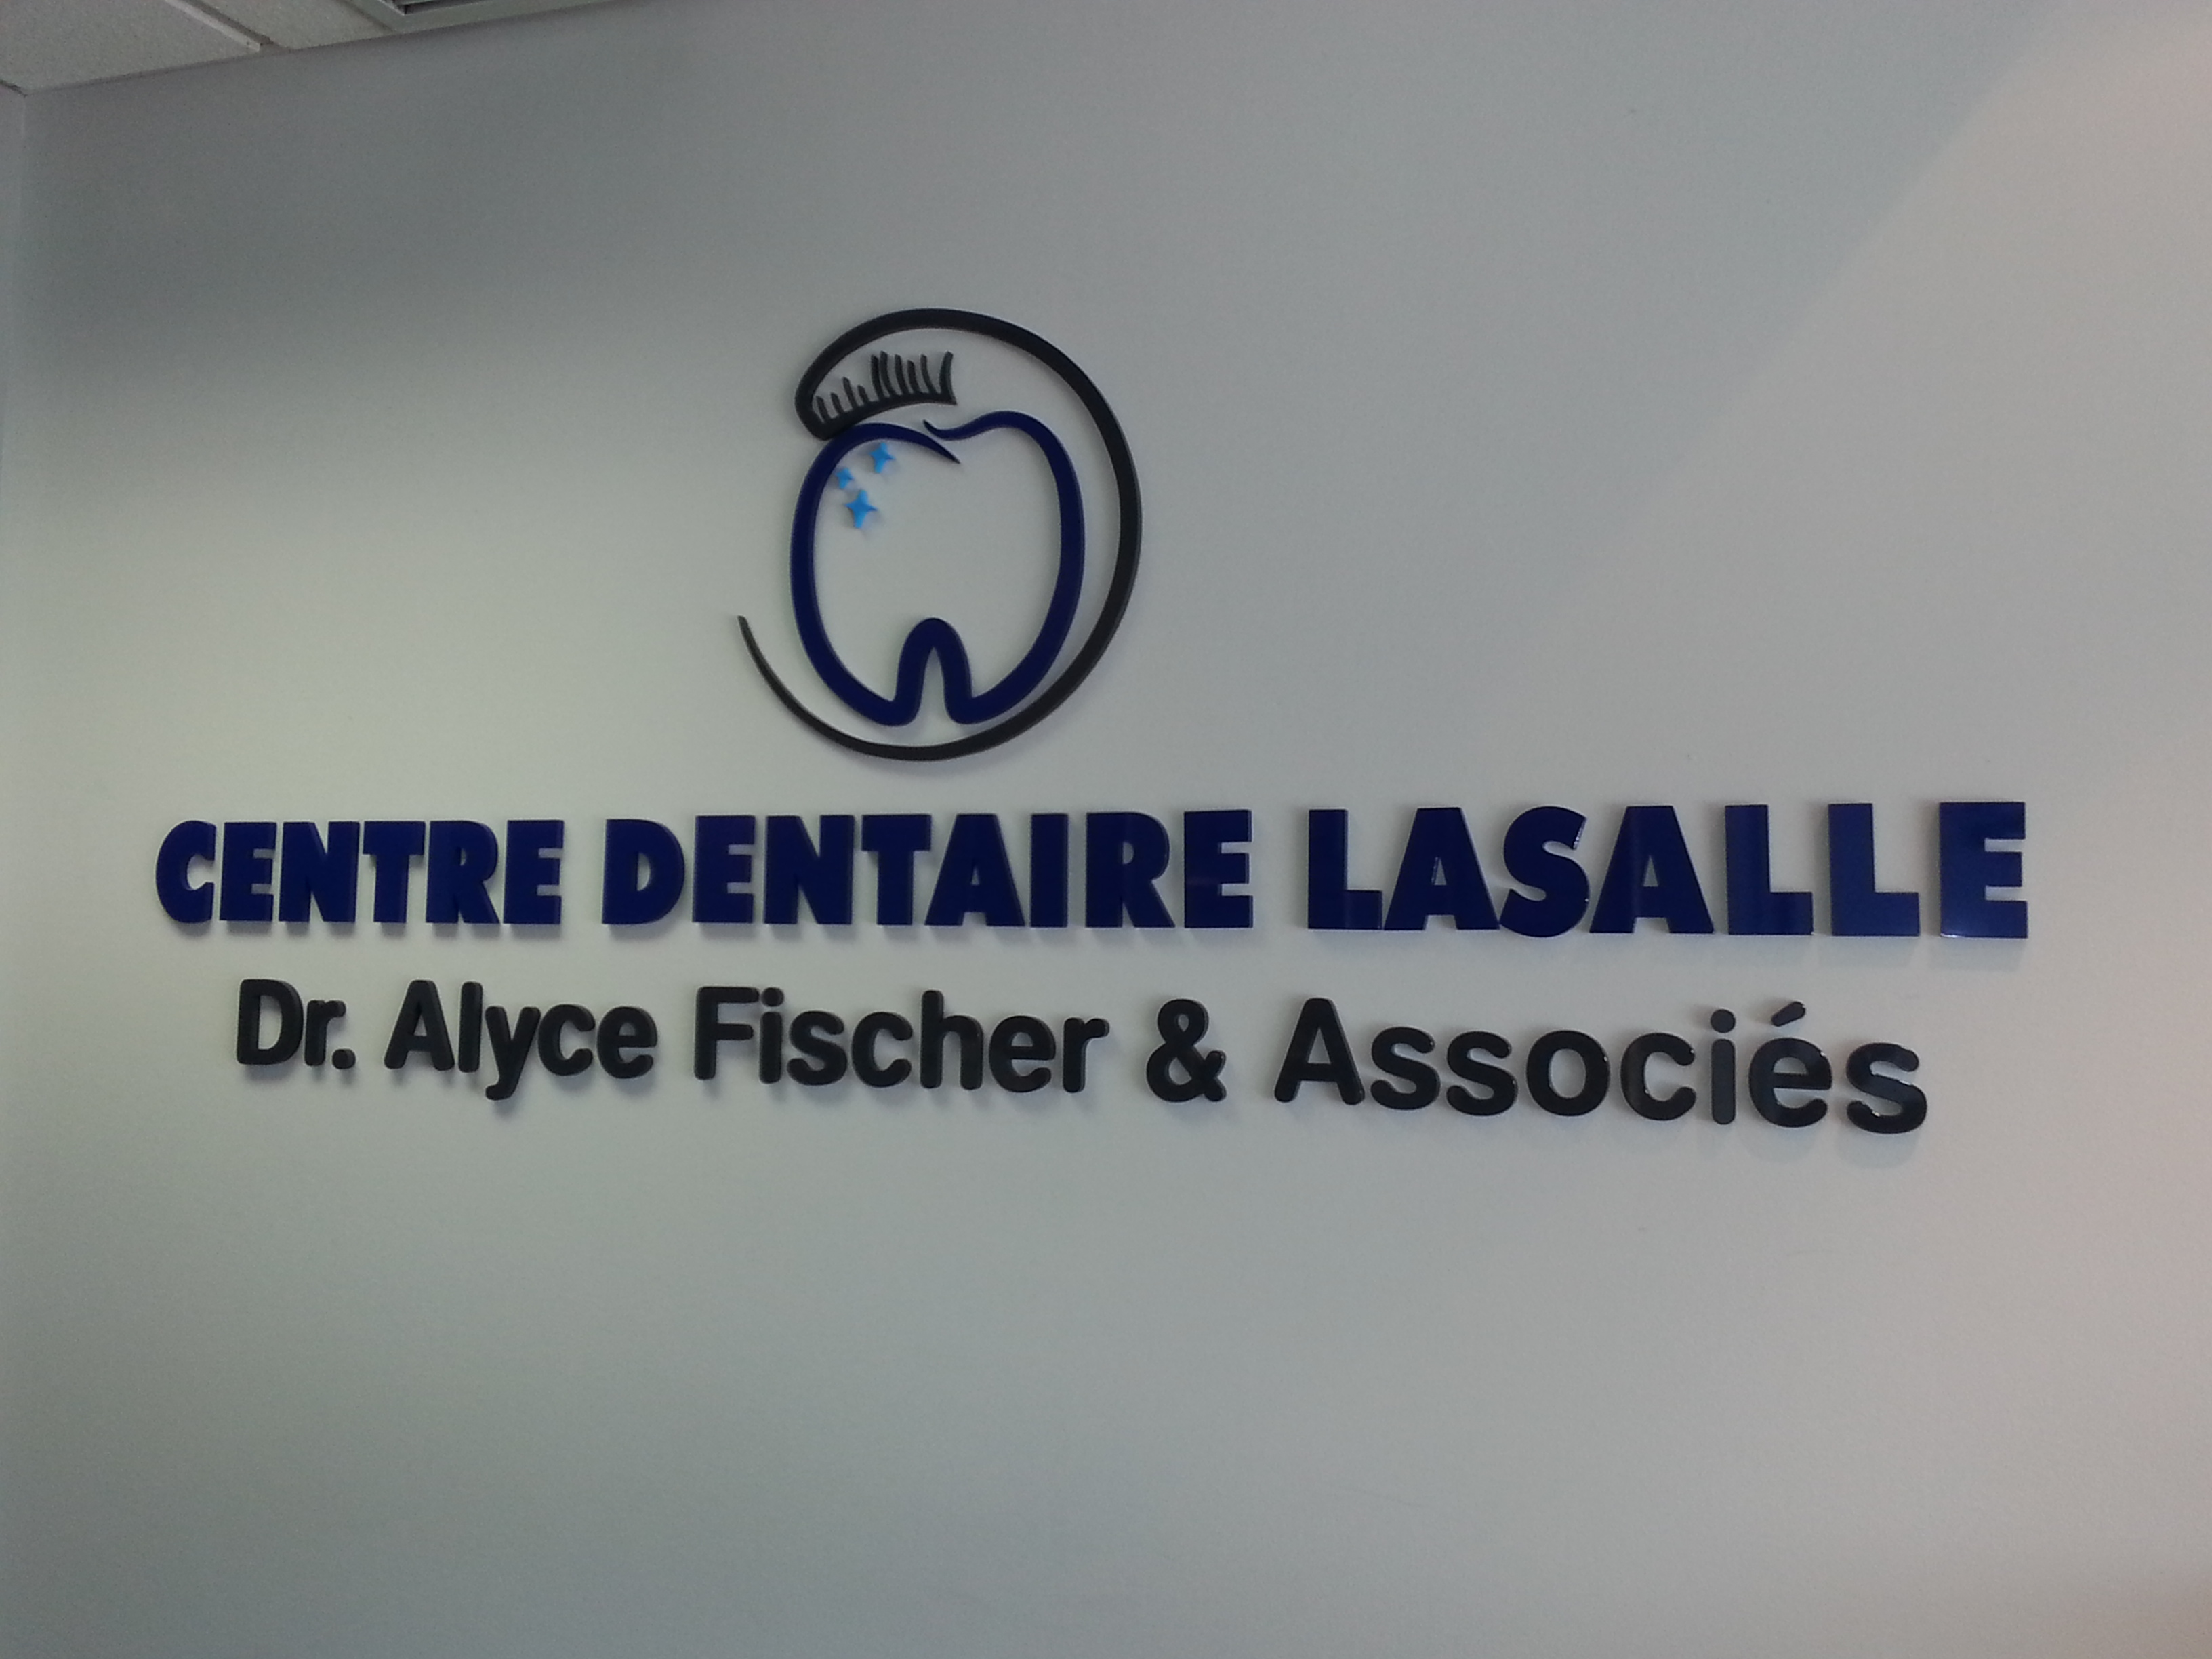 Centre Dentaire Lasalle